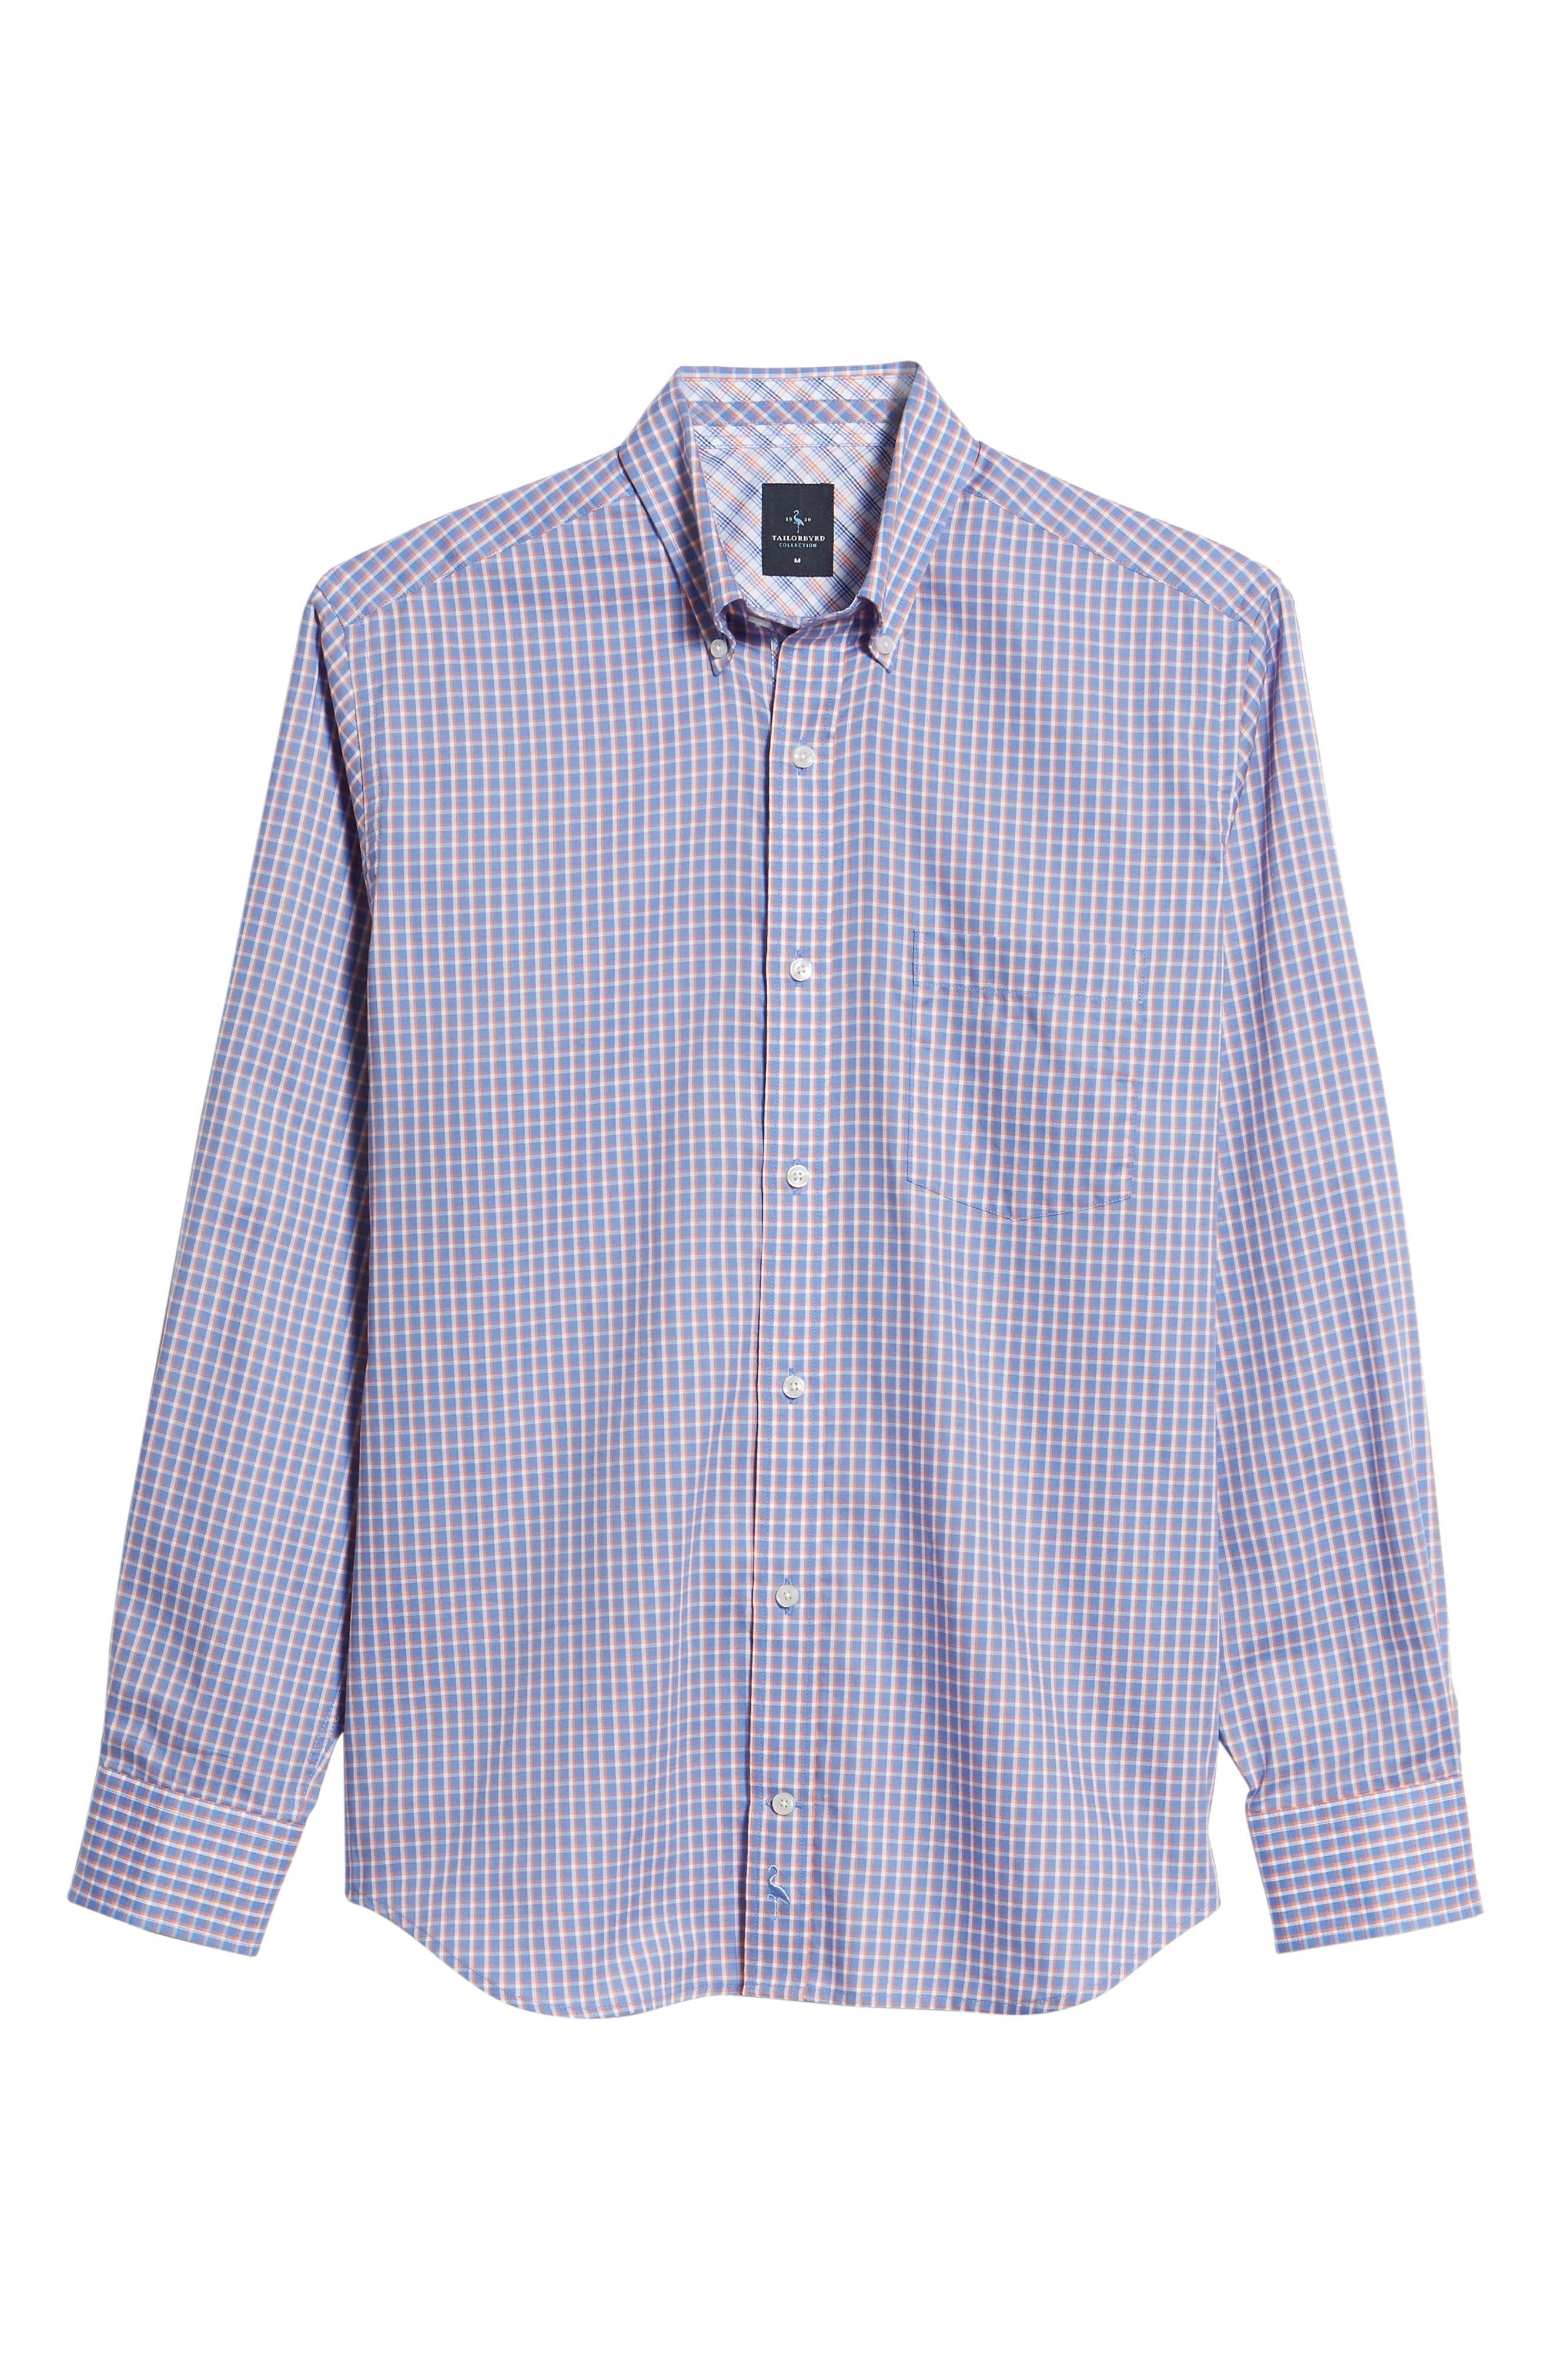 Bader Regular Fit Check Sport Shirt,                             Alternate thumbnail 6, color,                             400